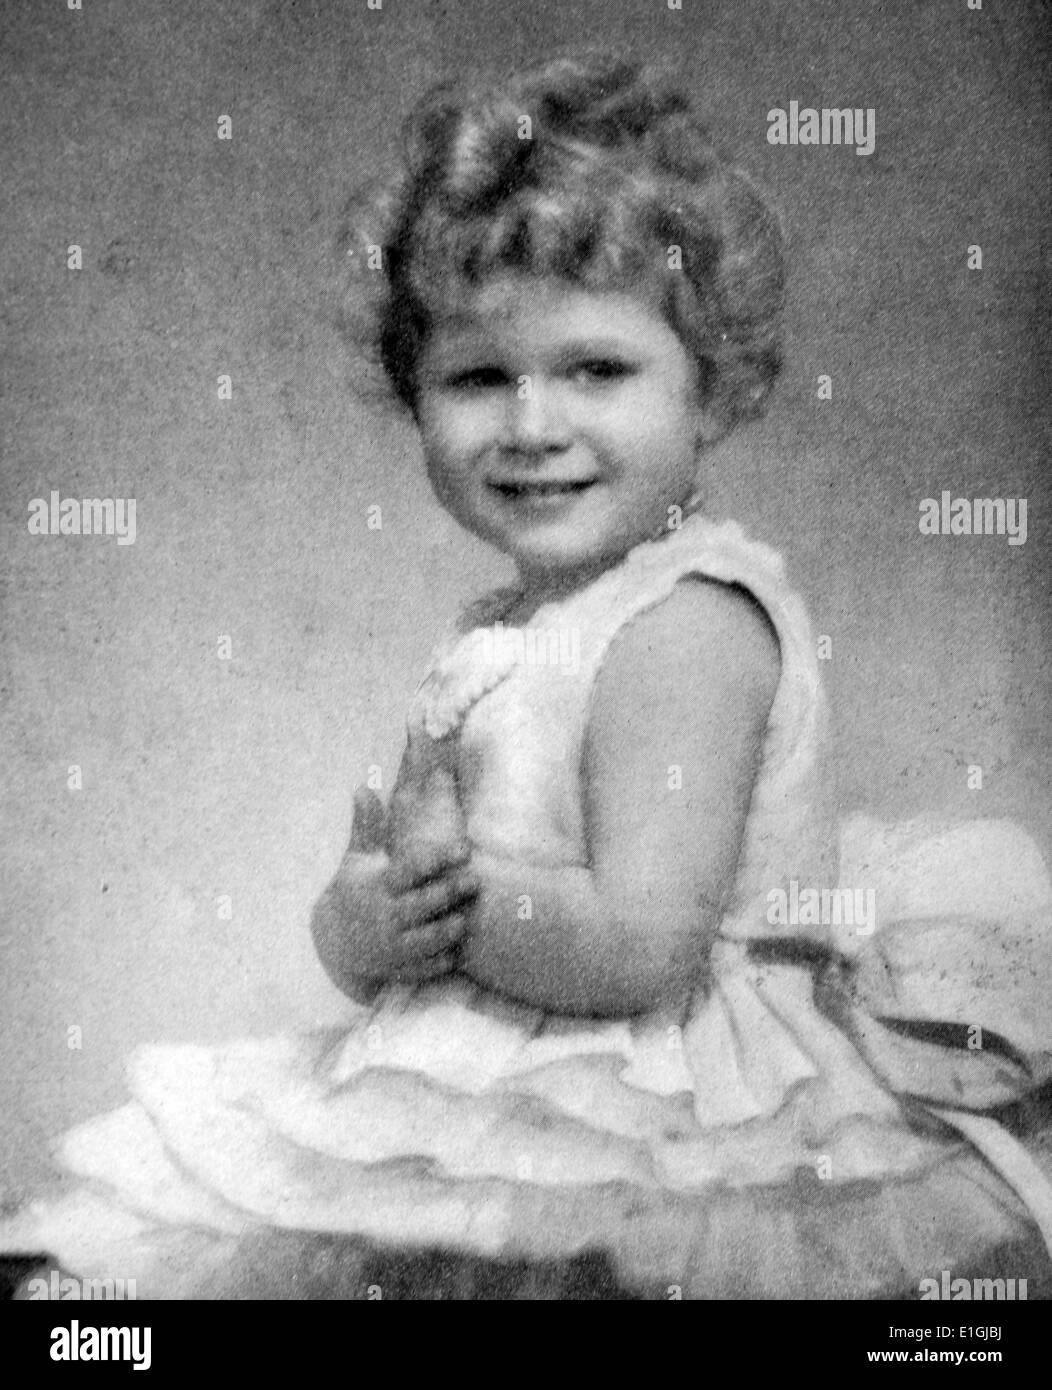 Princess Elizabeth aged 3 or 4. later Elizabeth II (Elizabeth Alexandra Mary; born 21 April 1926[a]) constitutional monarch of - Stock Image